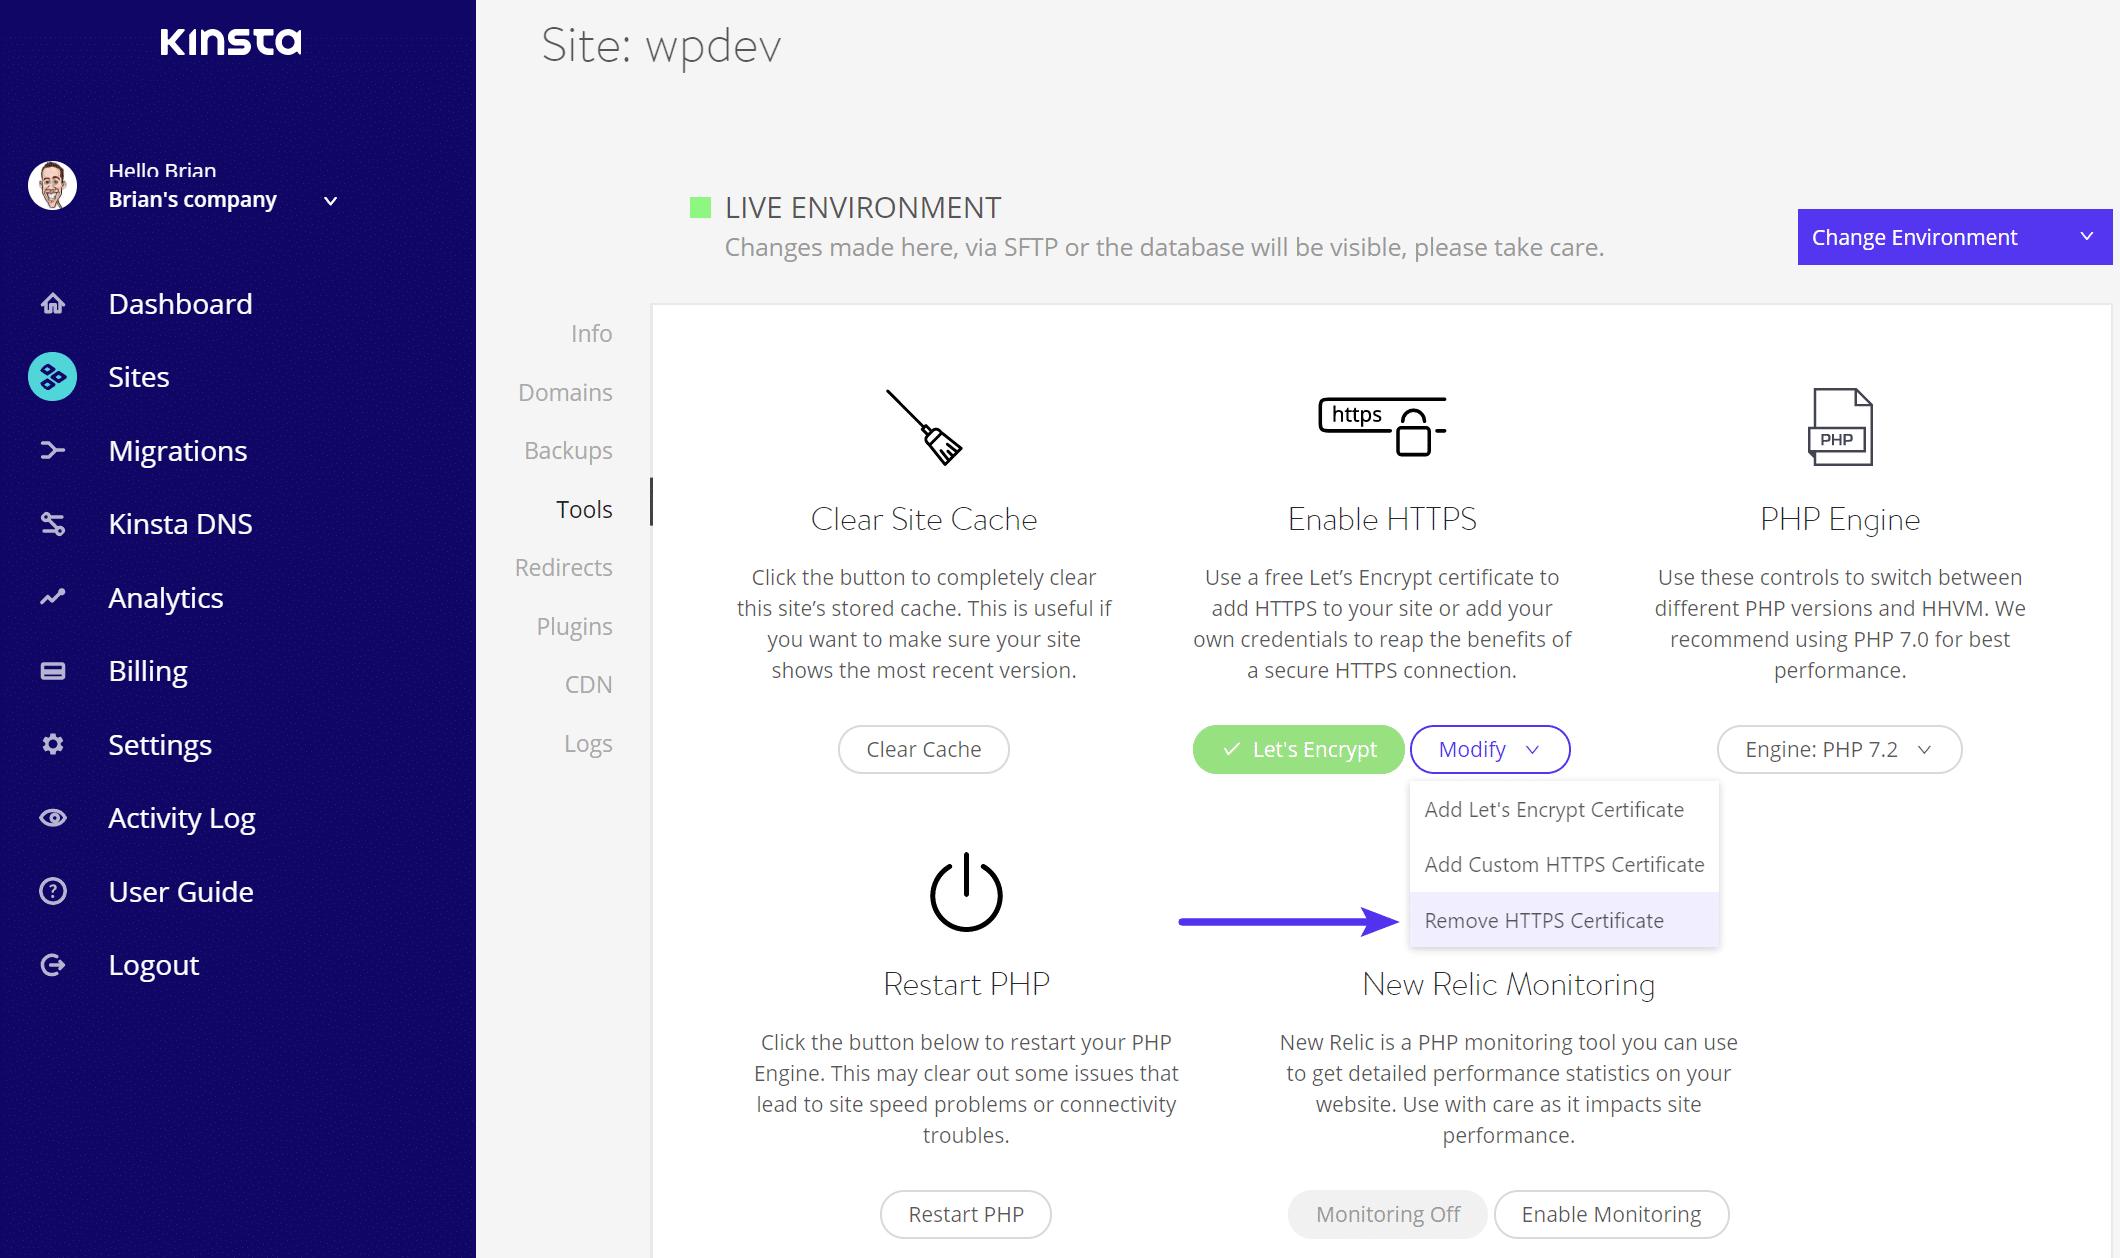 Ta bort HTTPS-certifikat